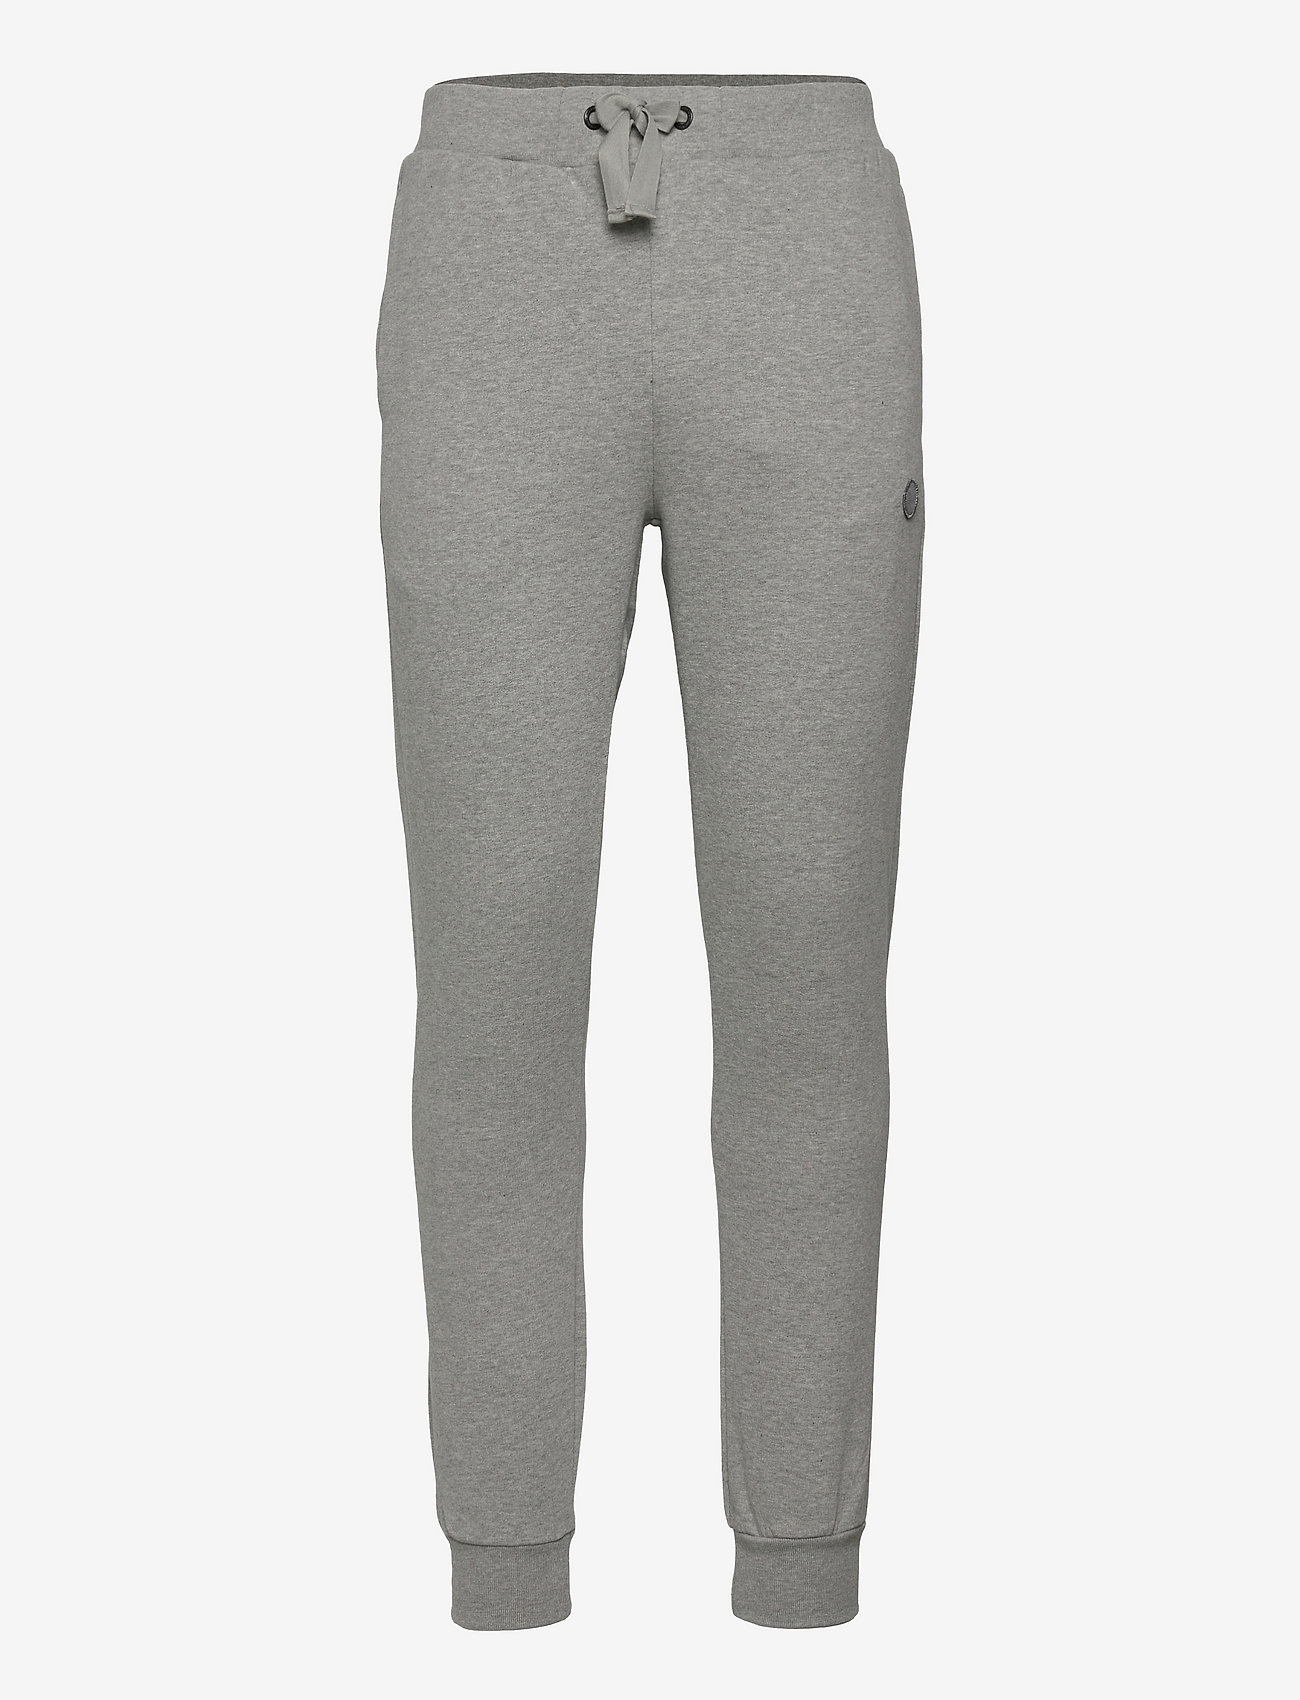 Knowledge Cotton Apparel - TEAK sweat pants - GOTS/Vegan - kleding - grey melange - 0